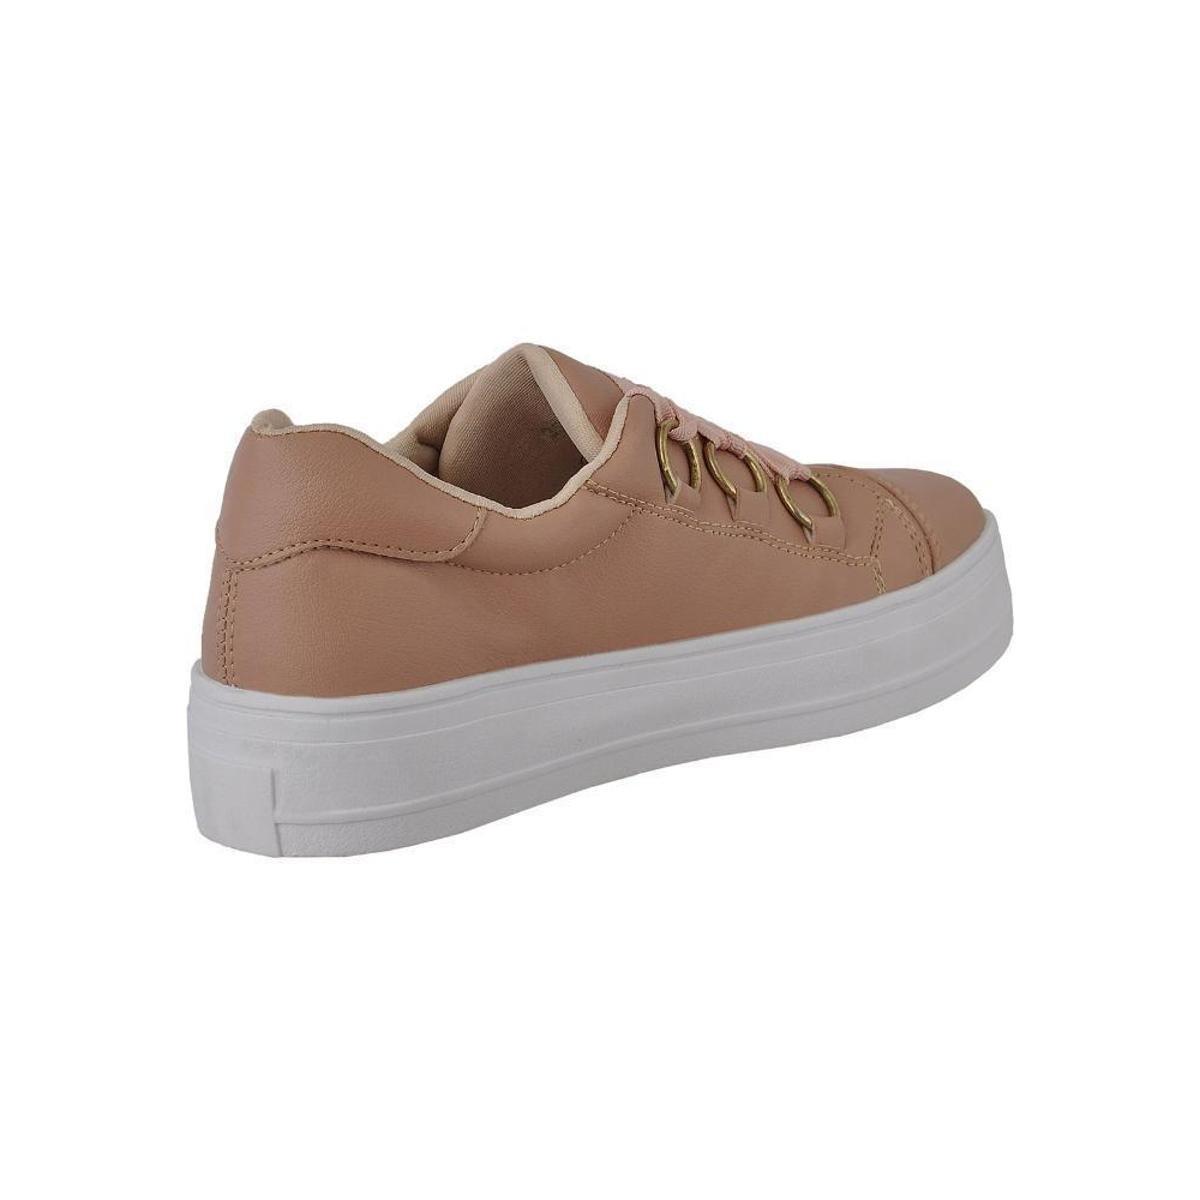 Tênis Novo Hábito Sneaker Flatform Feminino - Salmão fXkyo